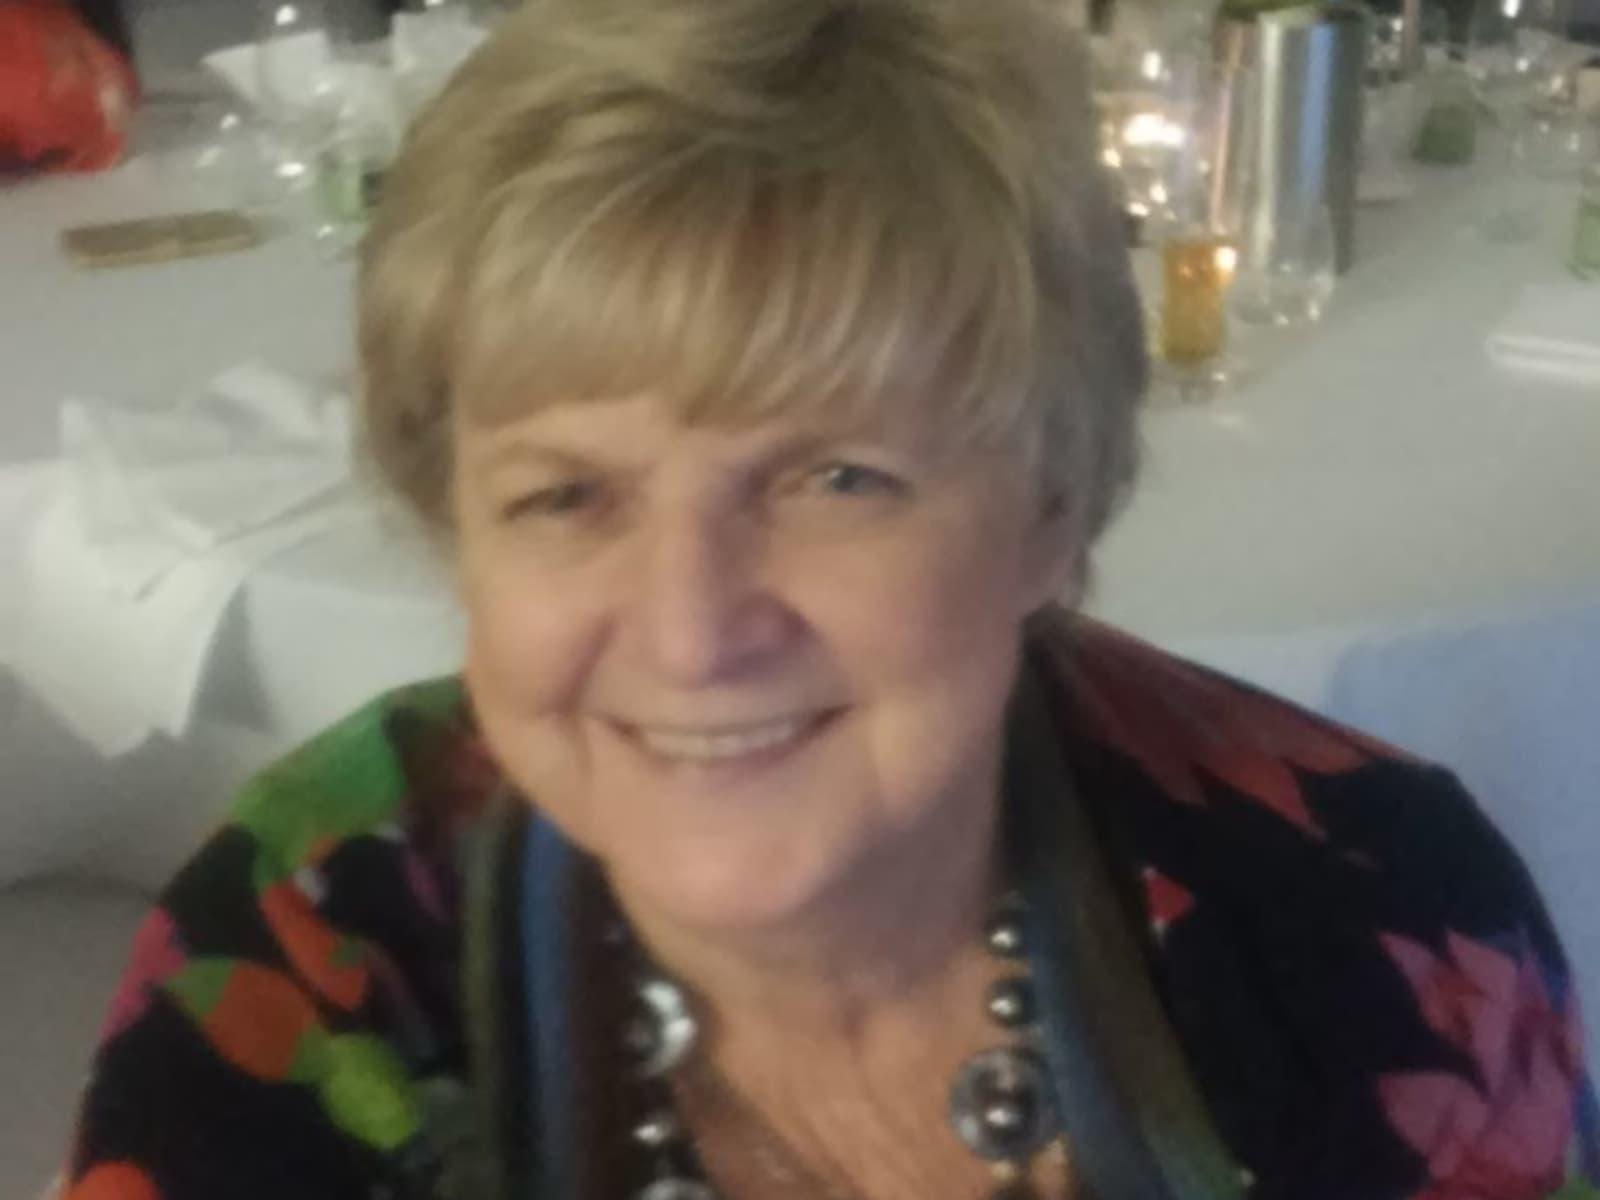 Patricia from Australia